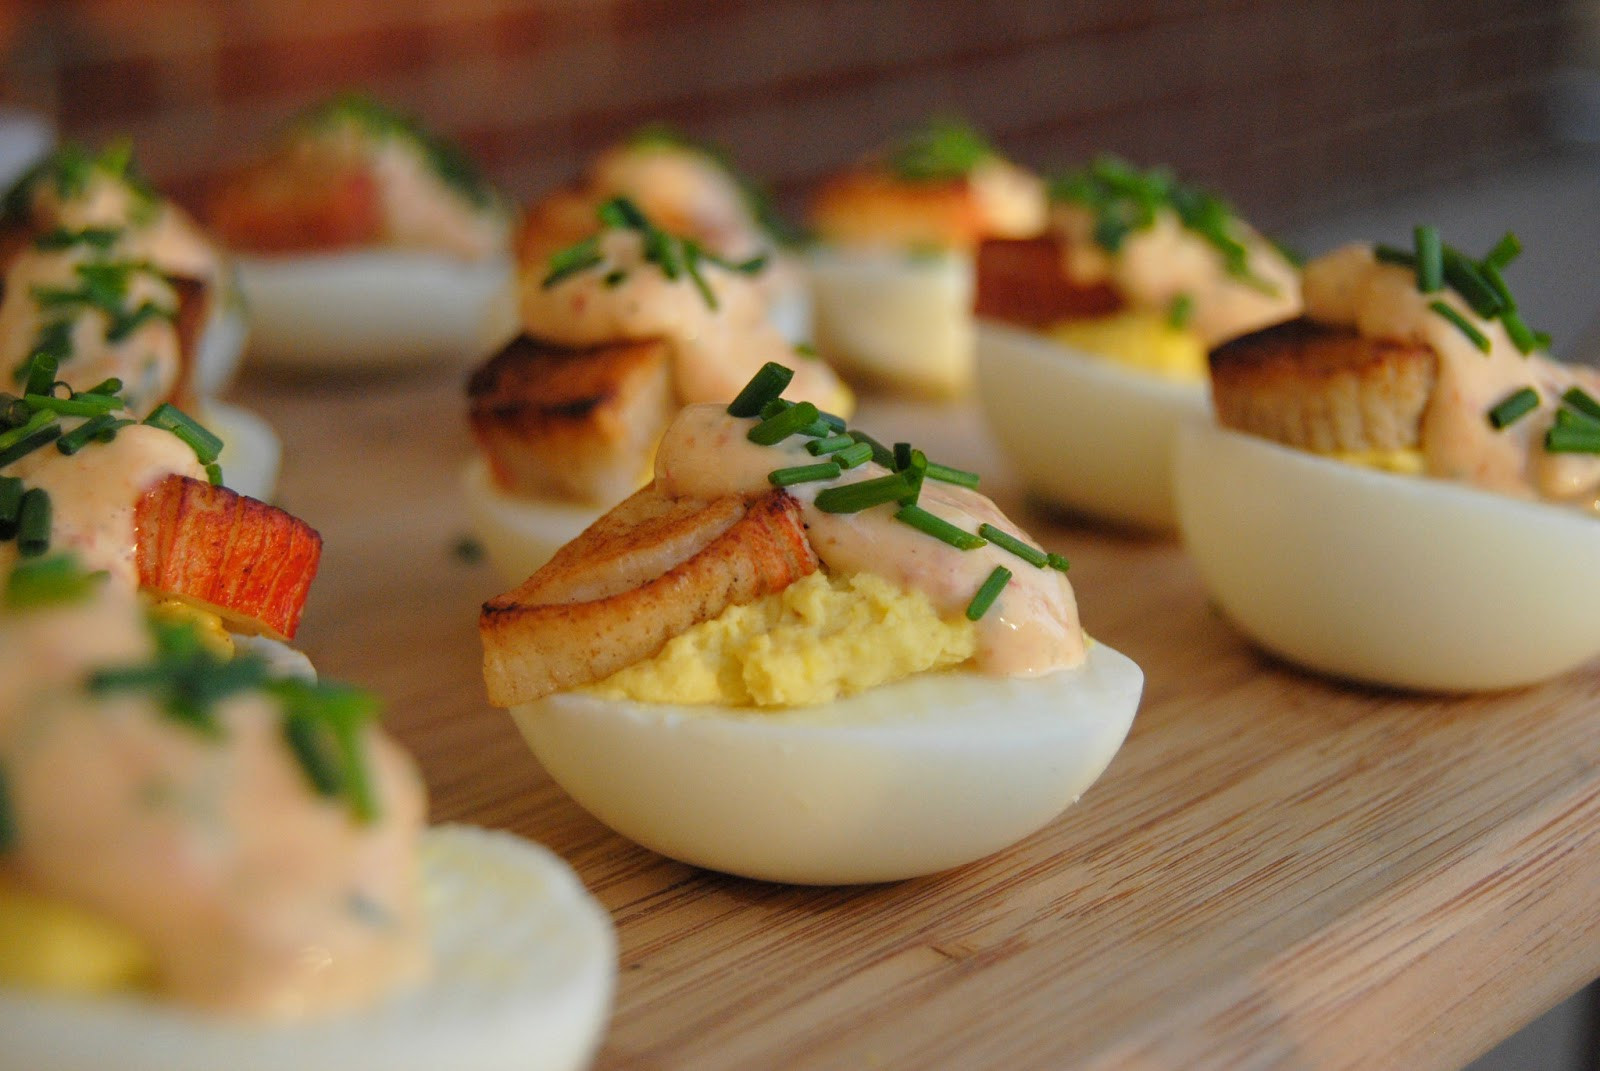 Fancy Deviled Eggs Recipe  SteakNPotatoesKindaGurl Crab and Chipotle Aioli Deviled Eggs